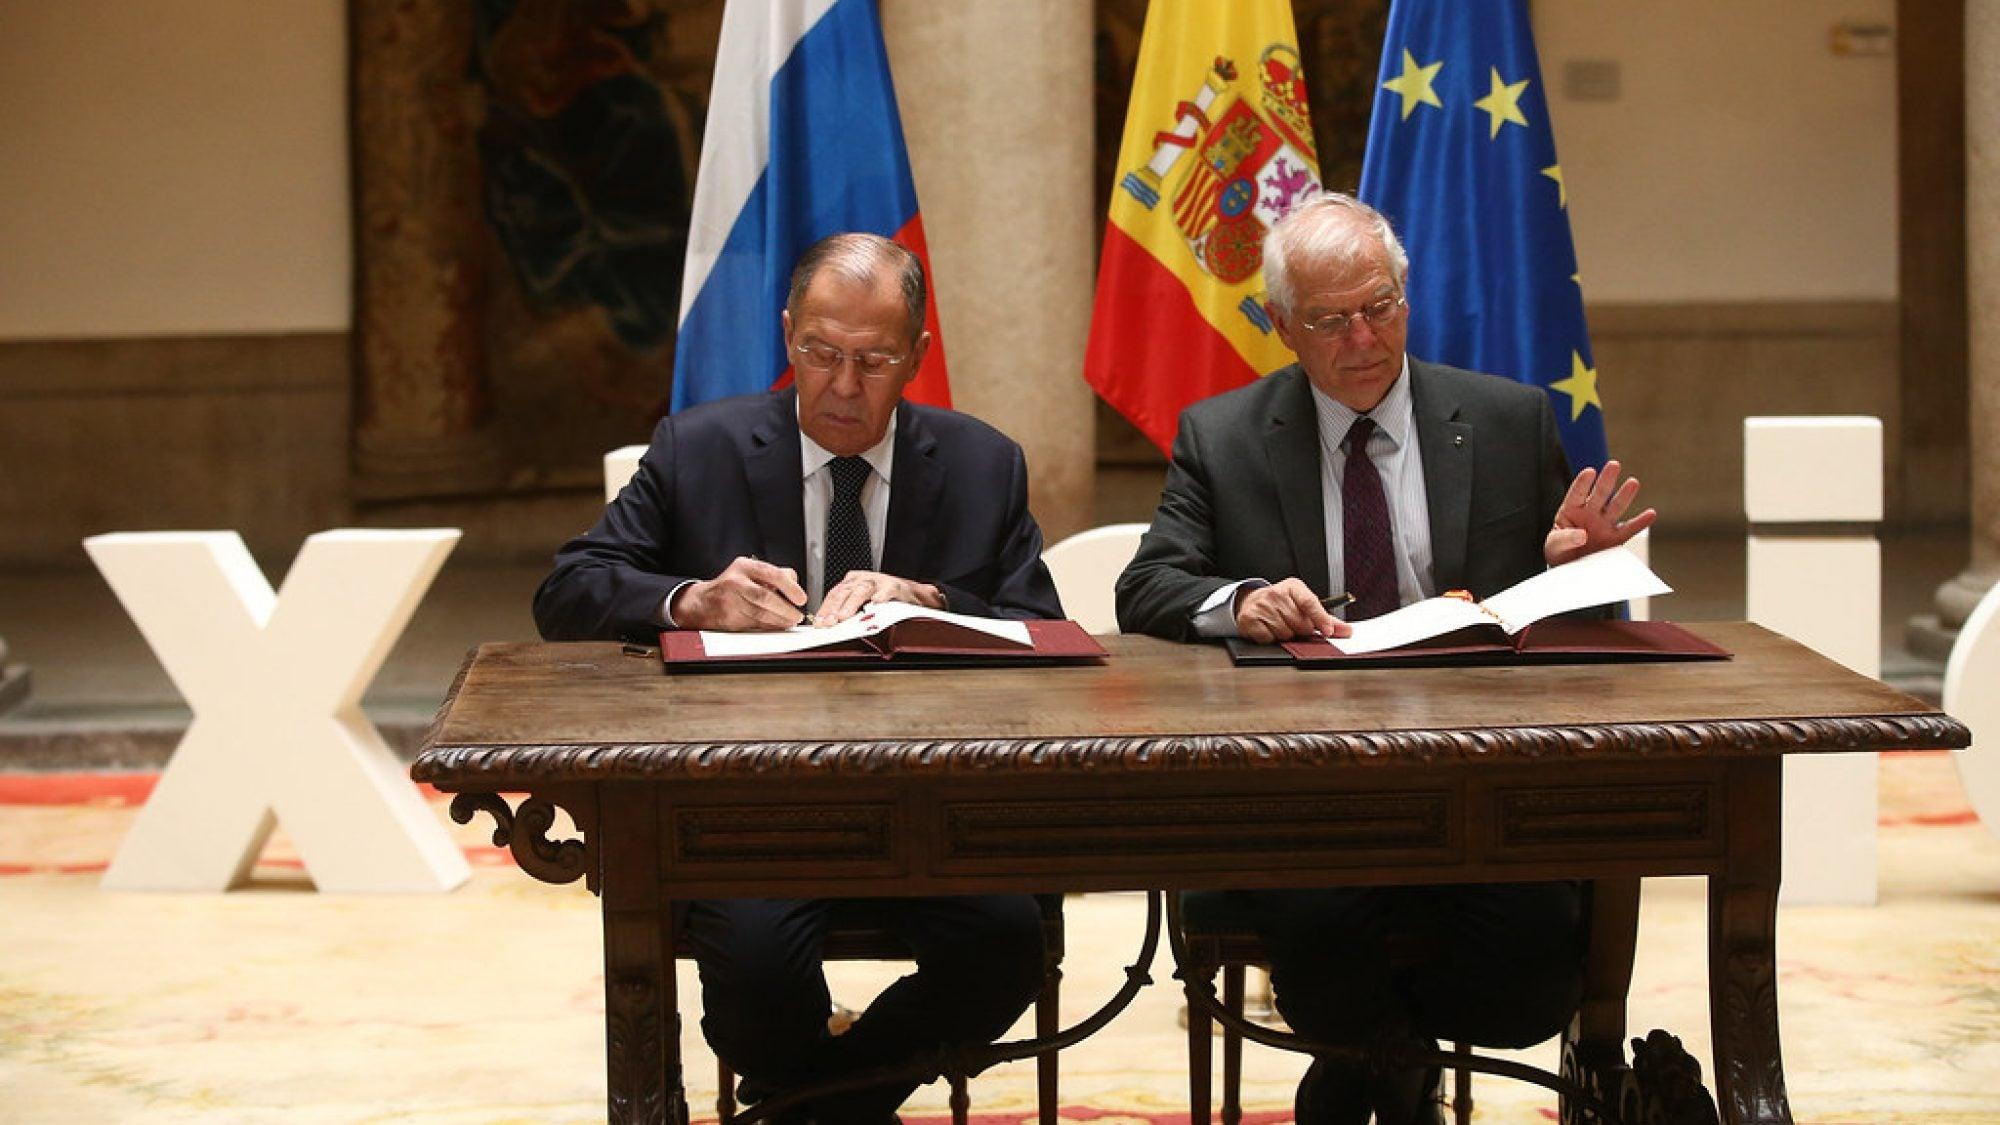 Sergei Lavrov and Josep Borrell Fontelles